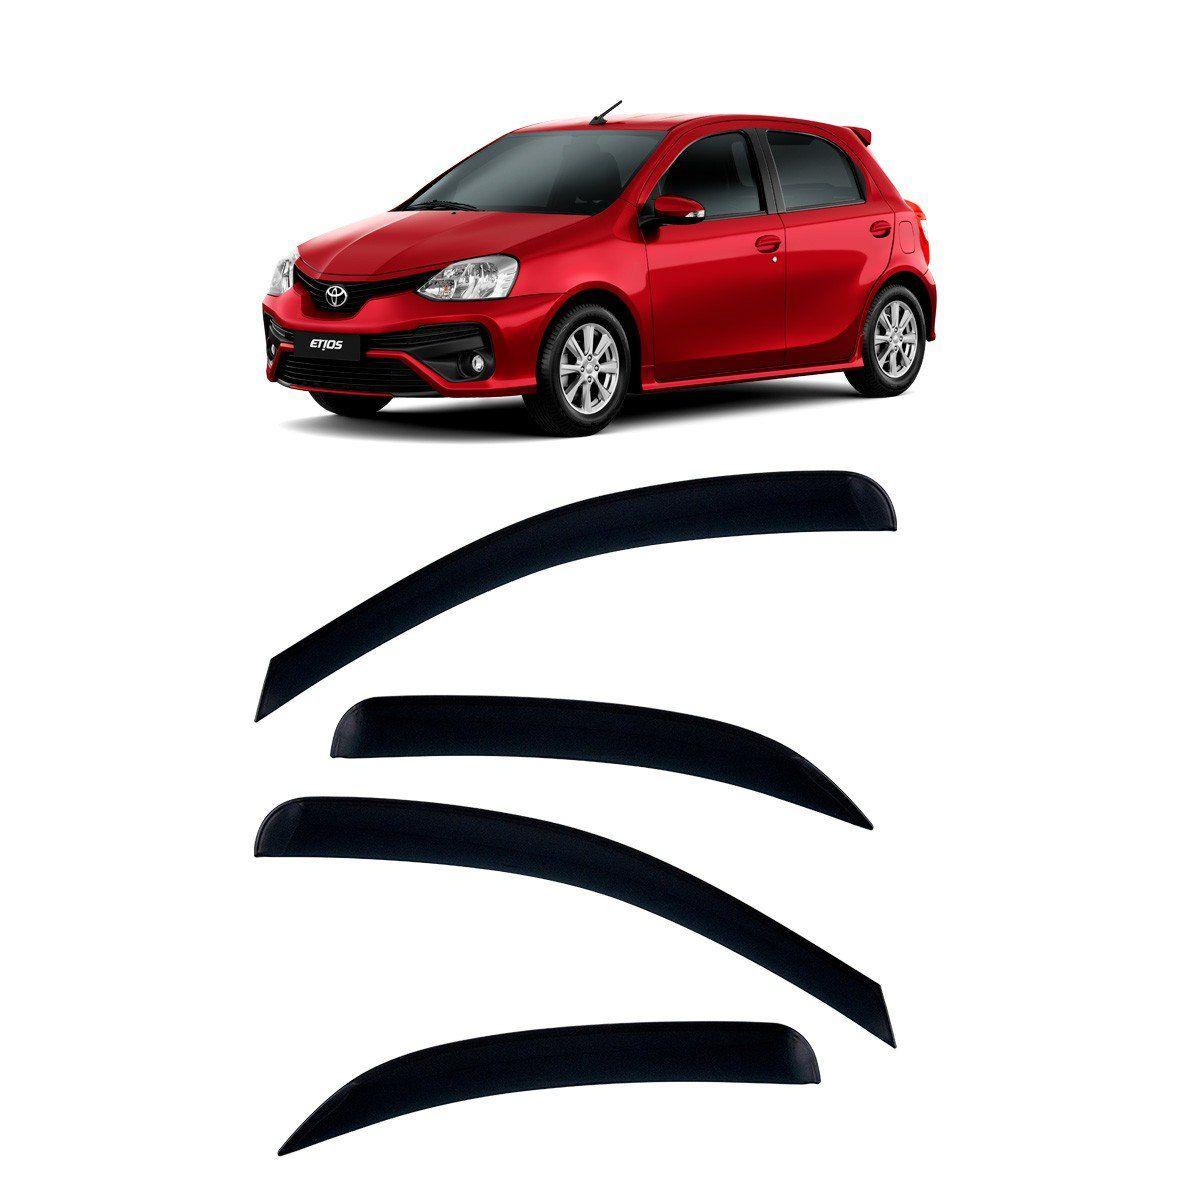 Calha De Chuva Etios Hatch E Sedan Defletor TG Poli